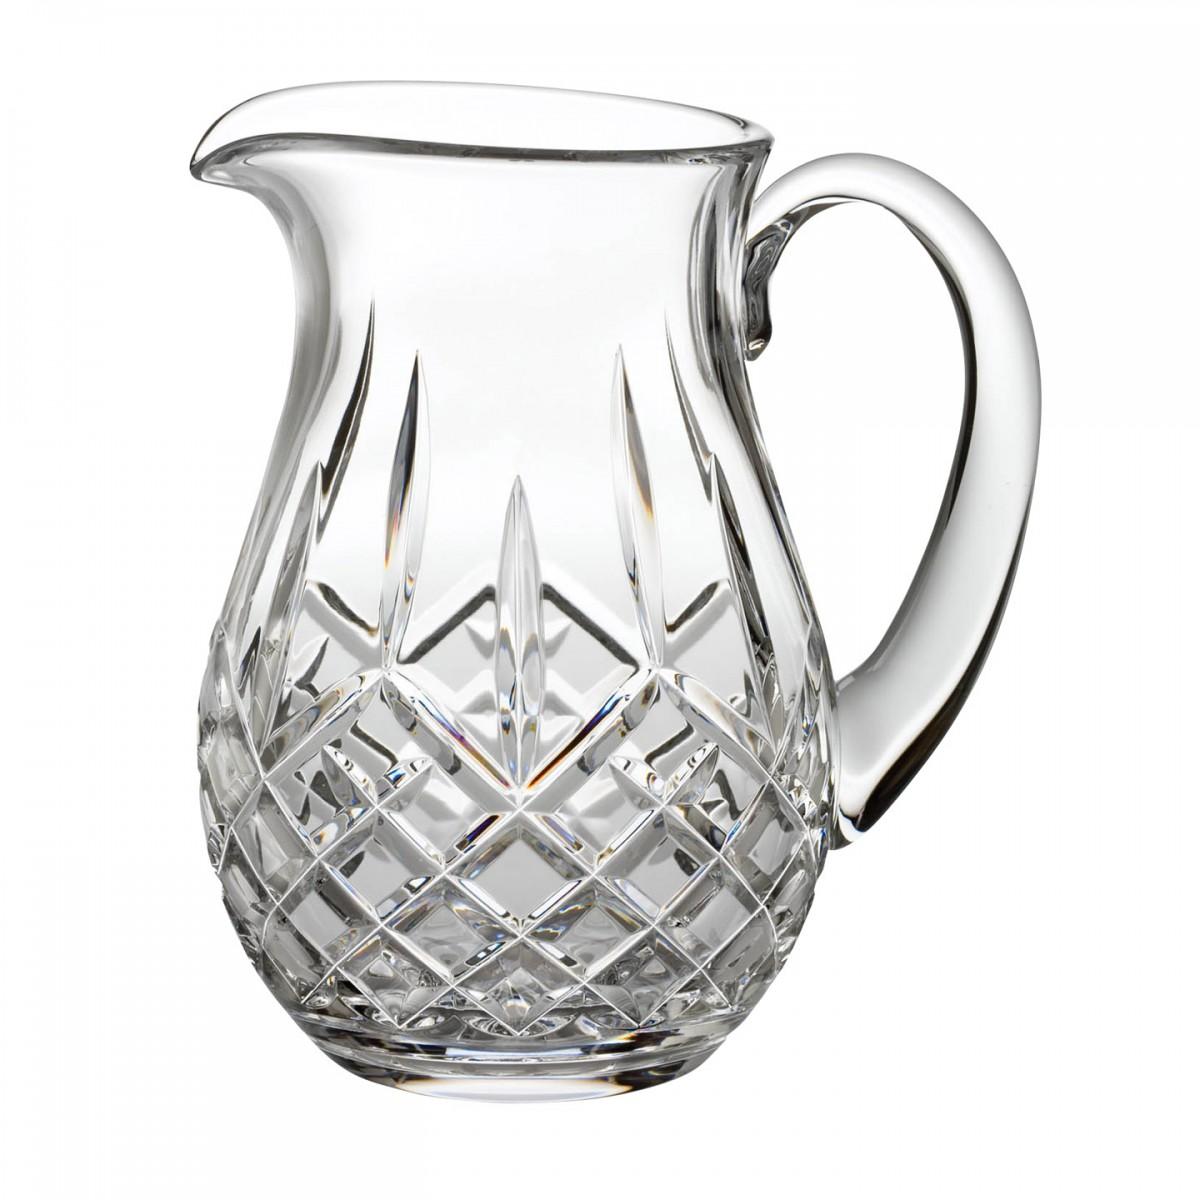 waterford-lismore-pitcher-091571138872.jpg